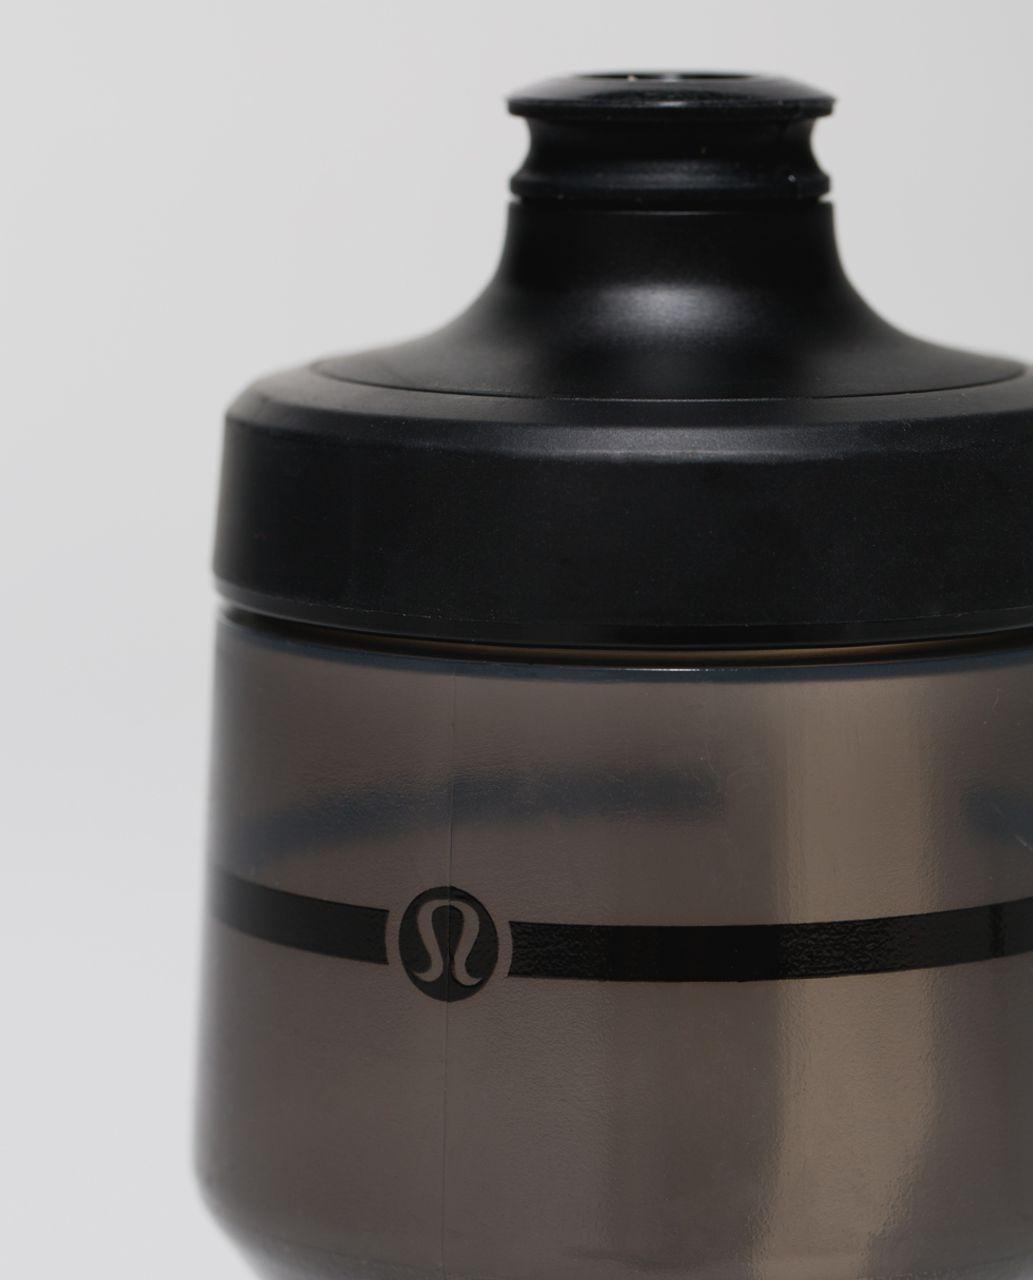 Lululemon Purist Cycling Water Bottle - Lotus Polka Dot Camo Black